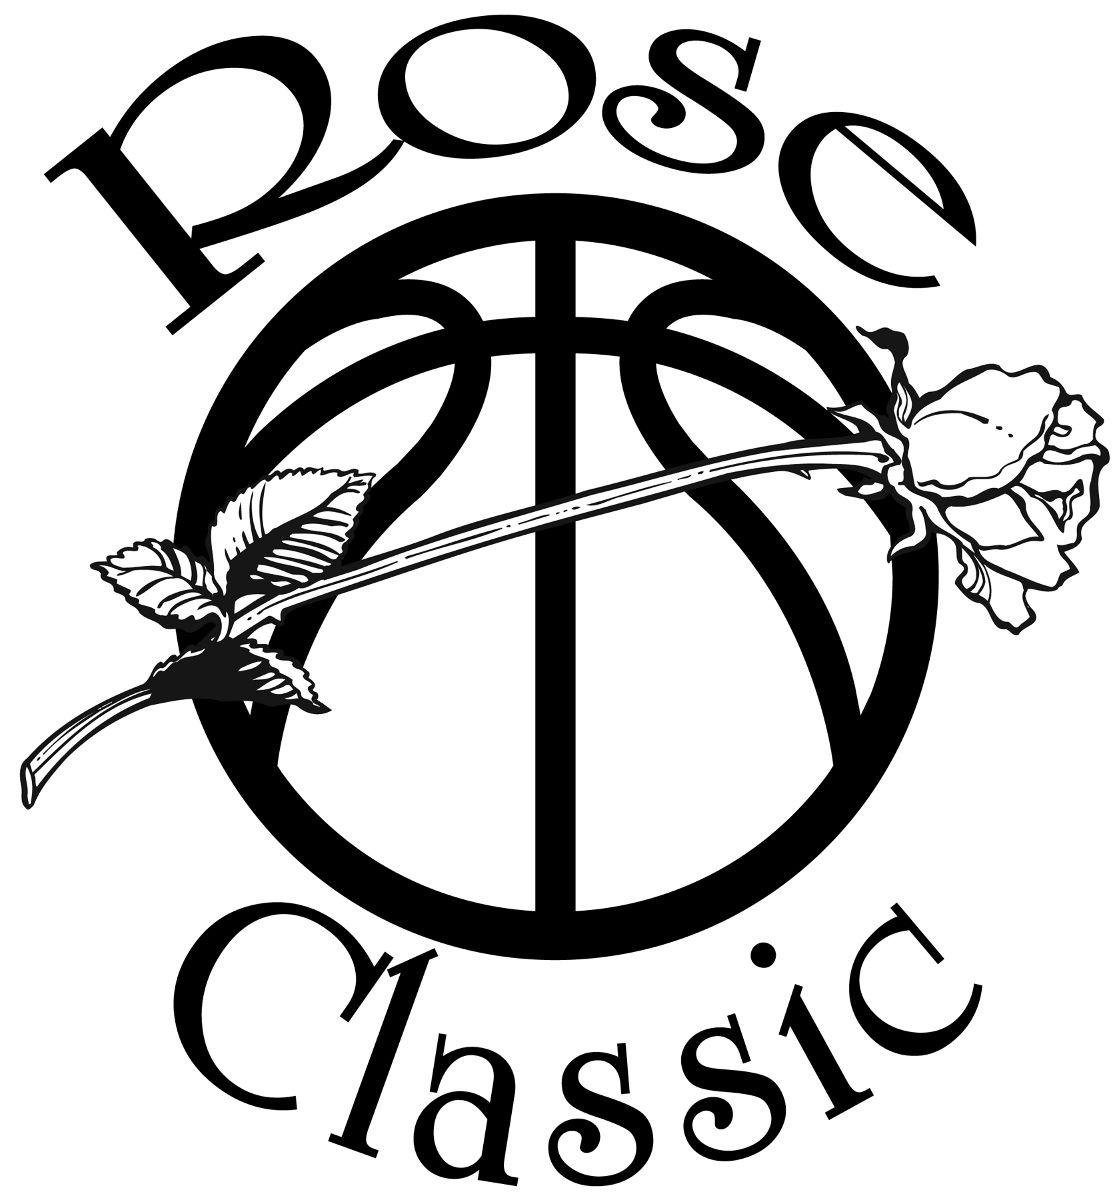 nike rose classic brooklyn ny